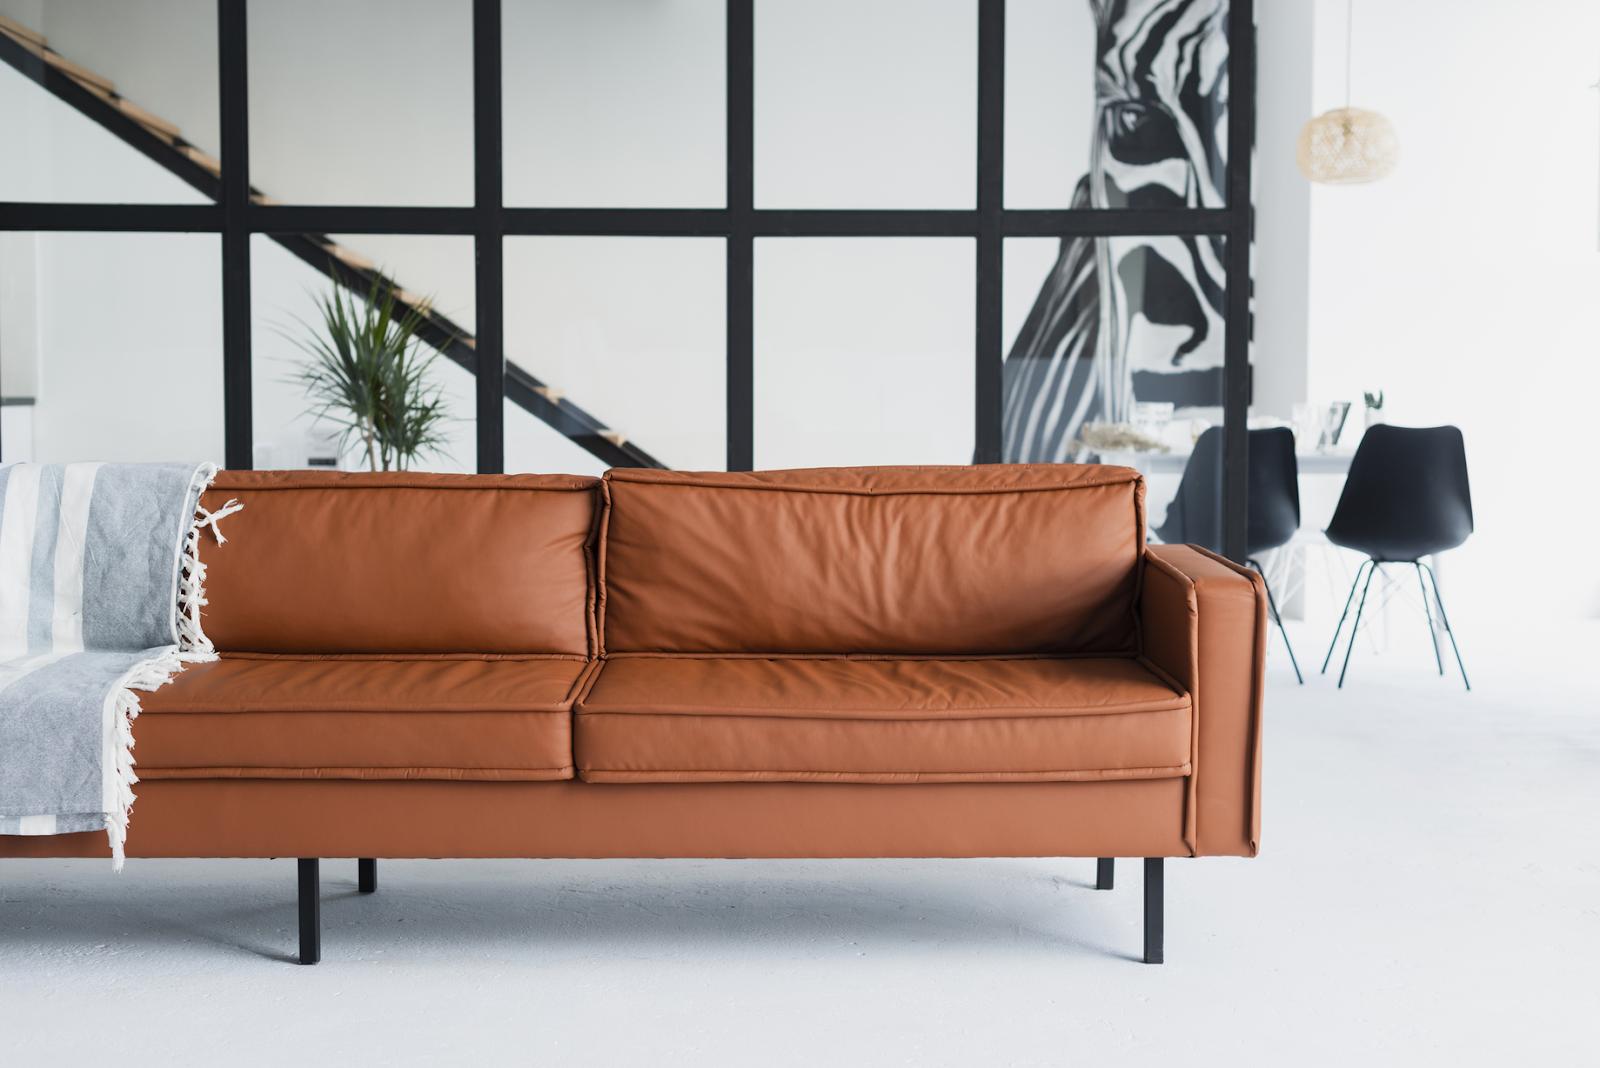 brown leather sofa on white flooring